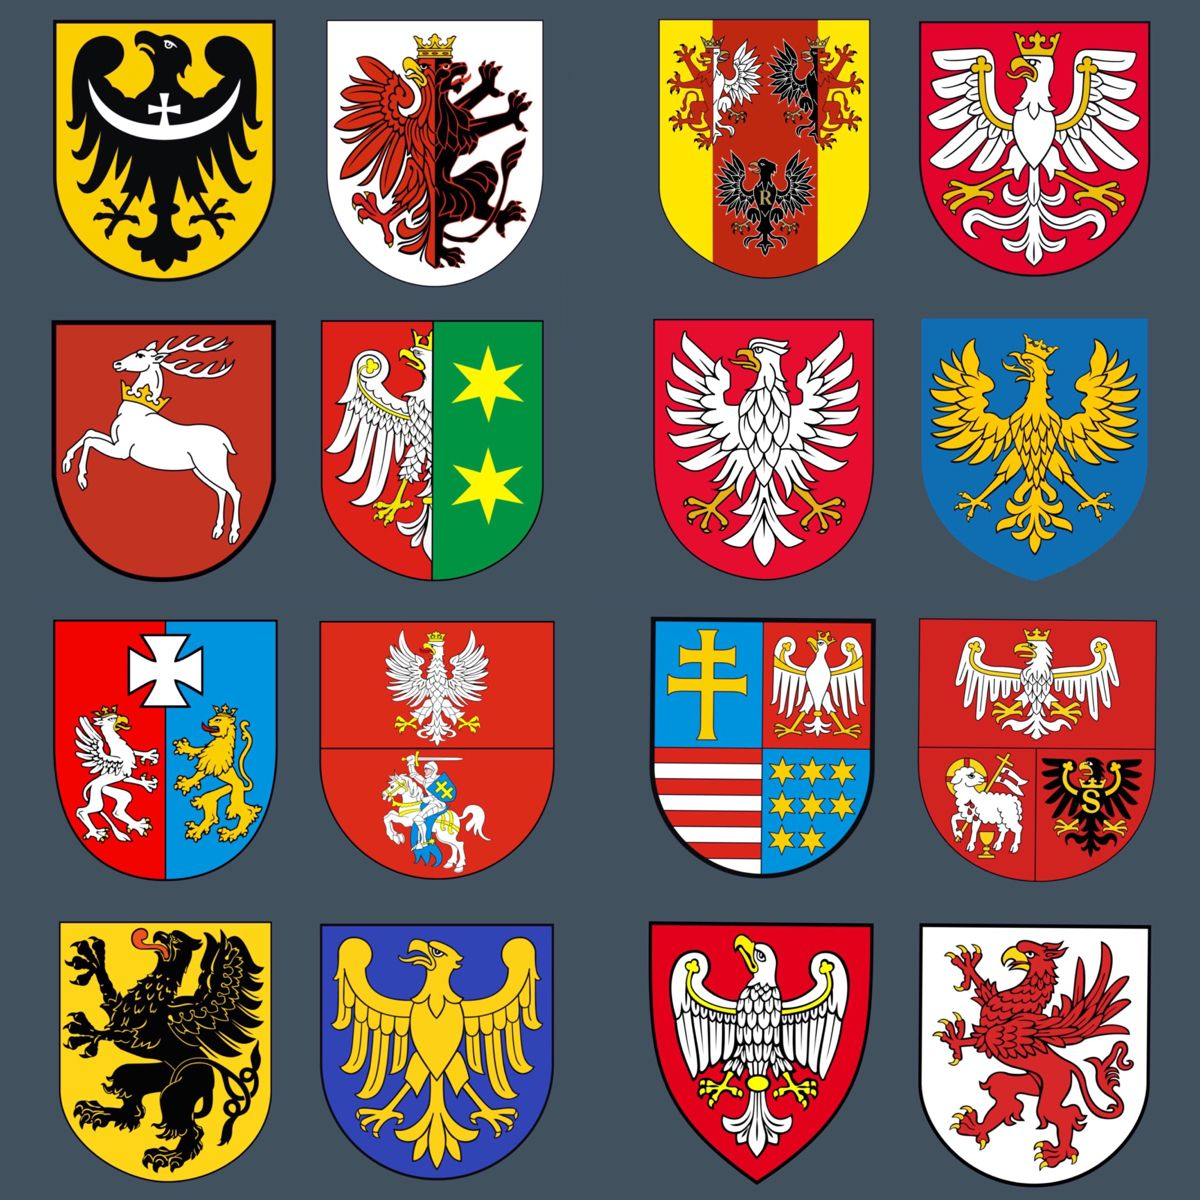 Pin By Blake Konczal On Polish Heraldry In 2020 Coat Of Arms Heraldry Miniature Painting